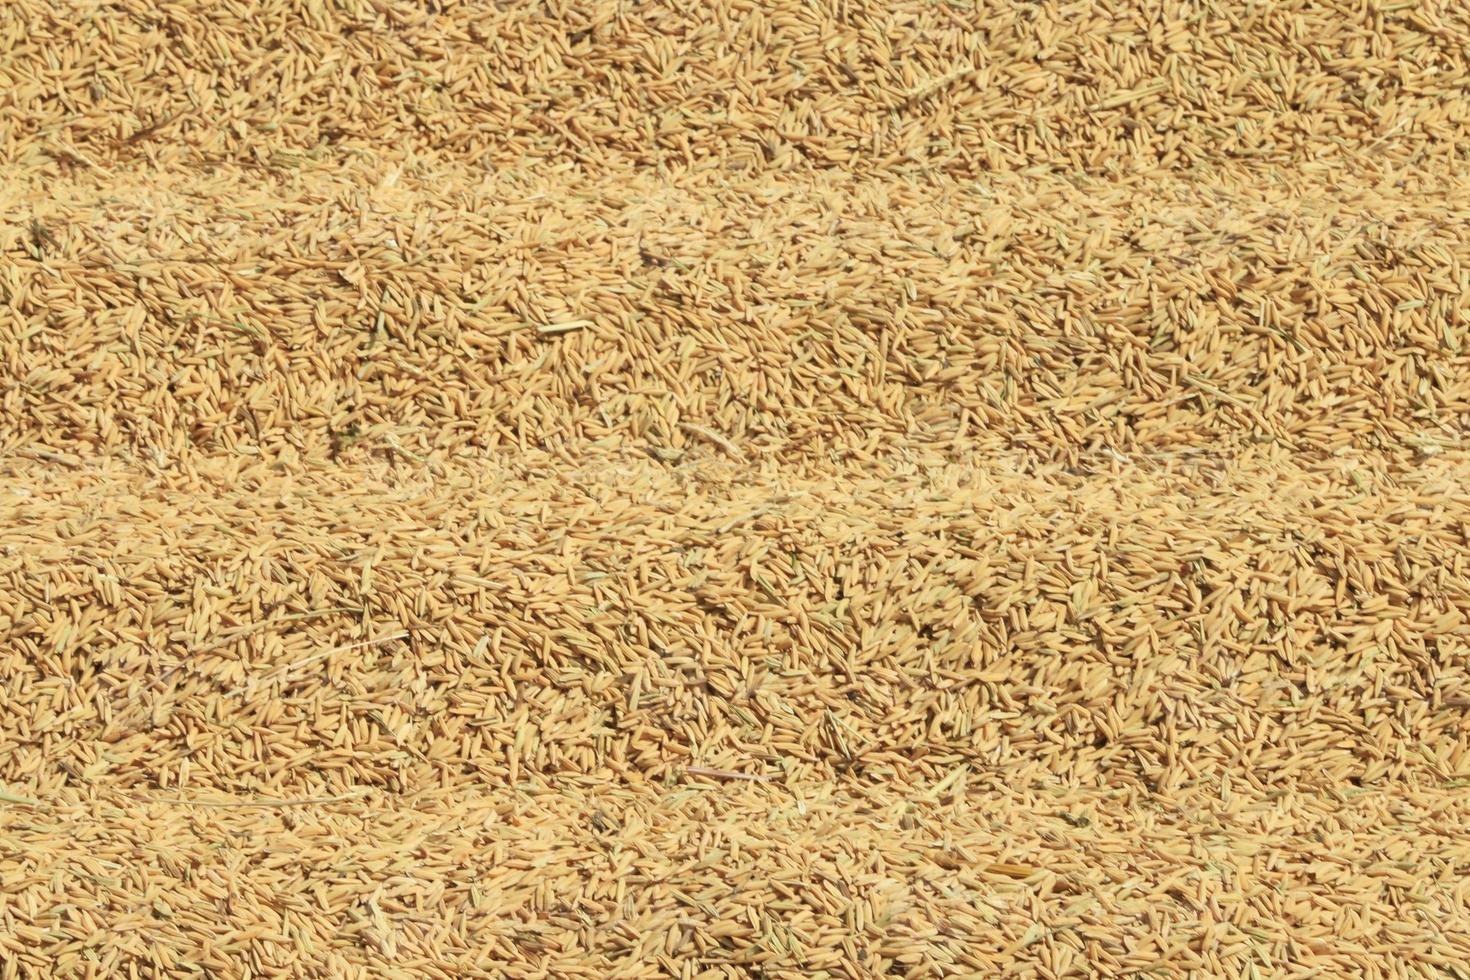 bouchent le riz paddy. photo